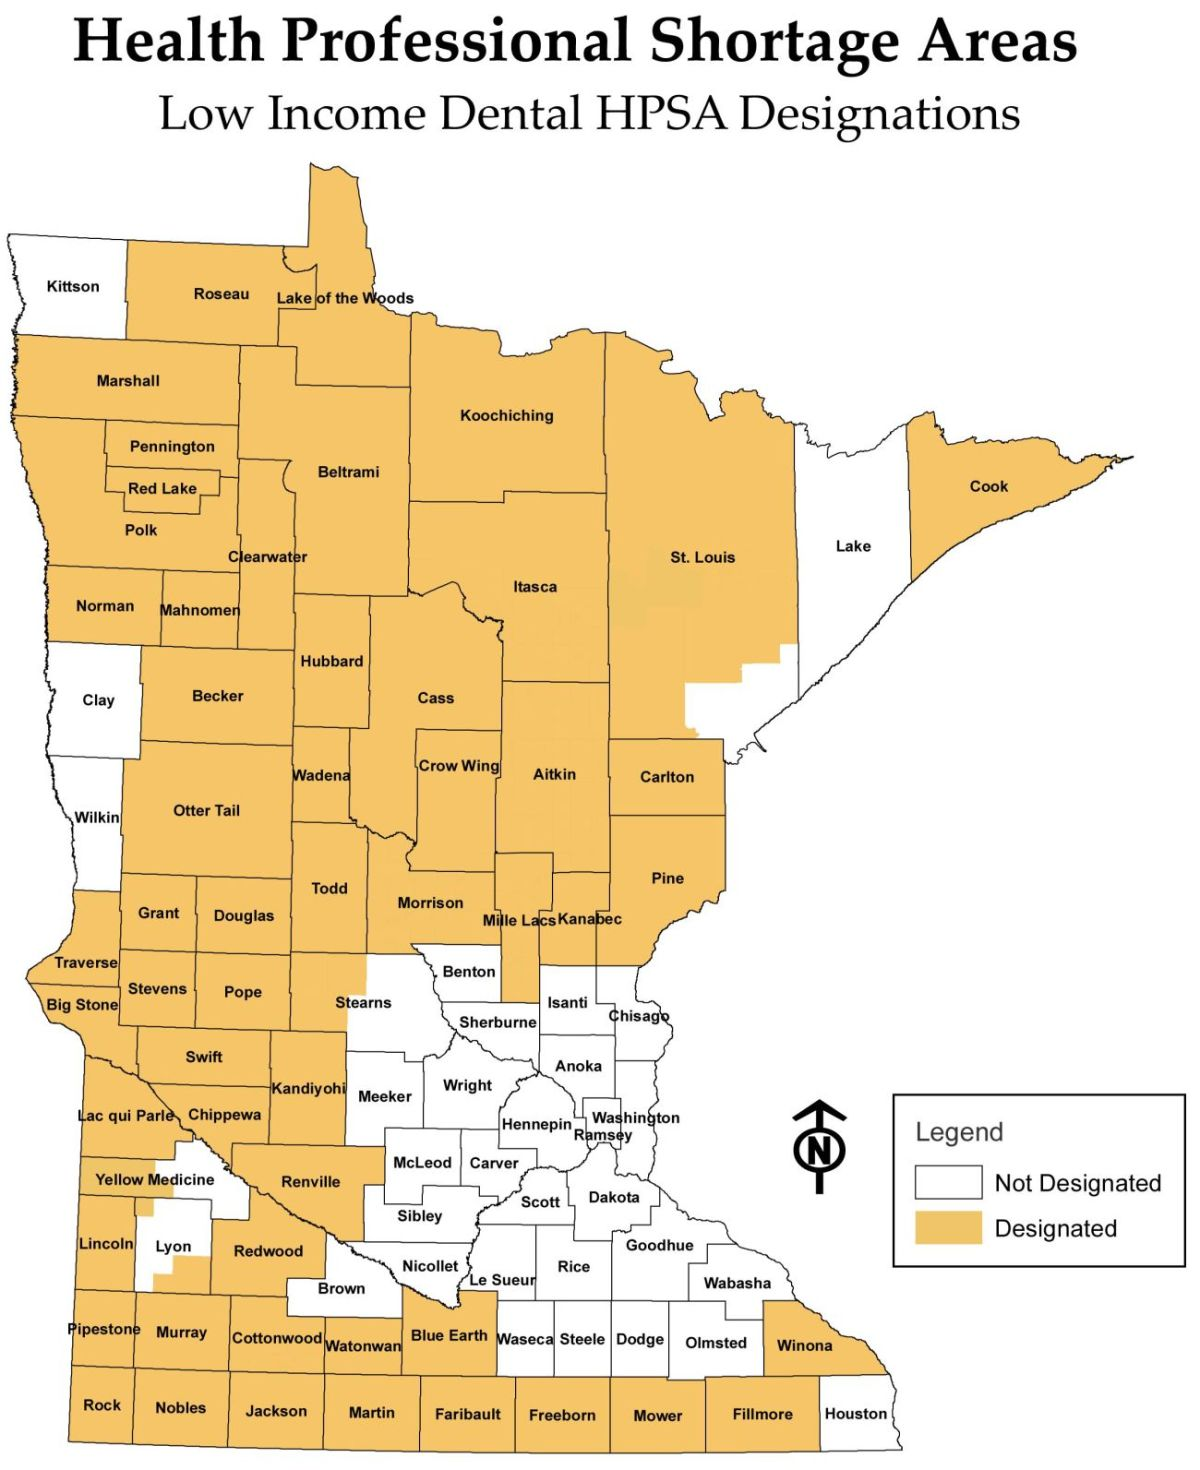 small resolution of health professional shortage areas hspa low income dental hpsa designations minnesota